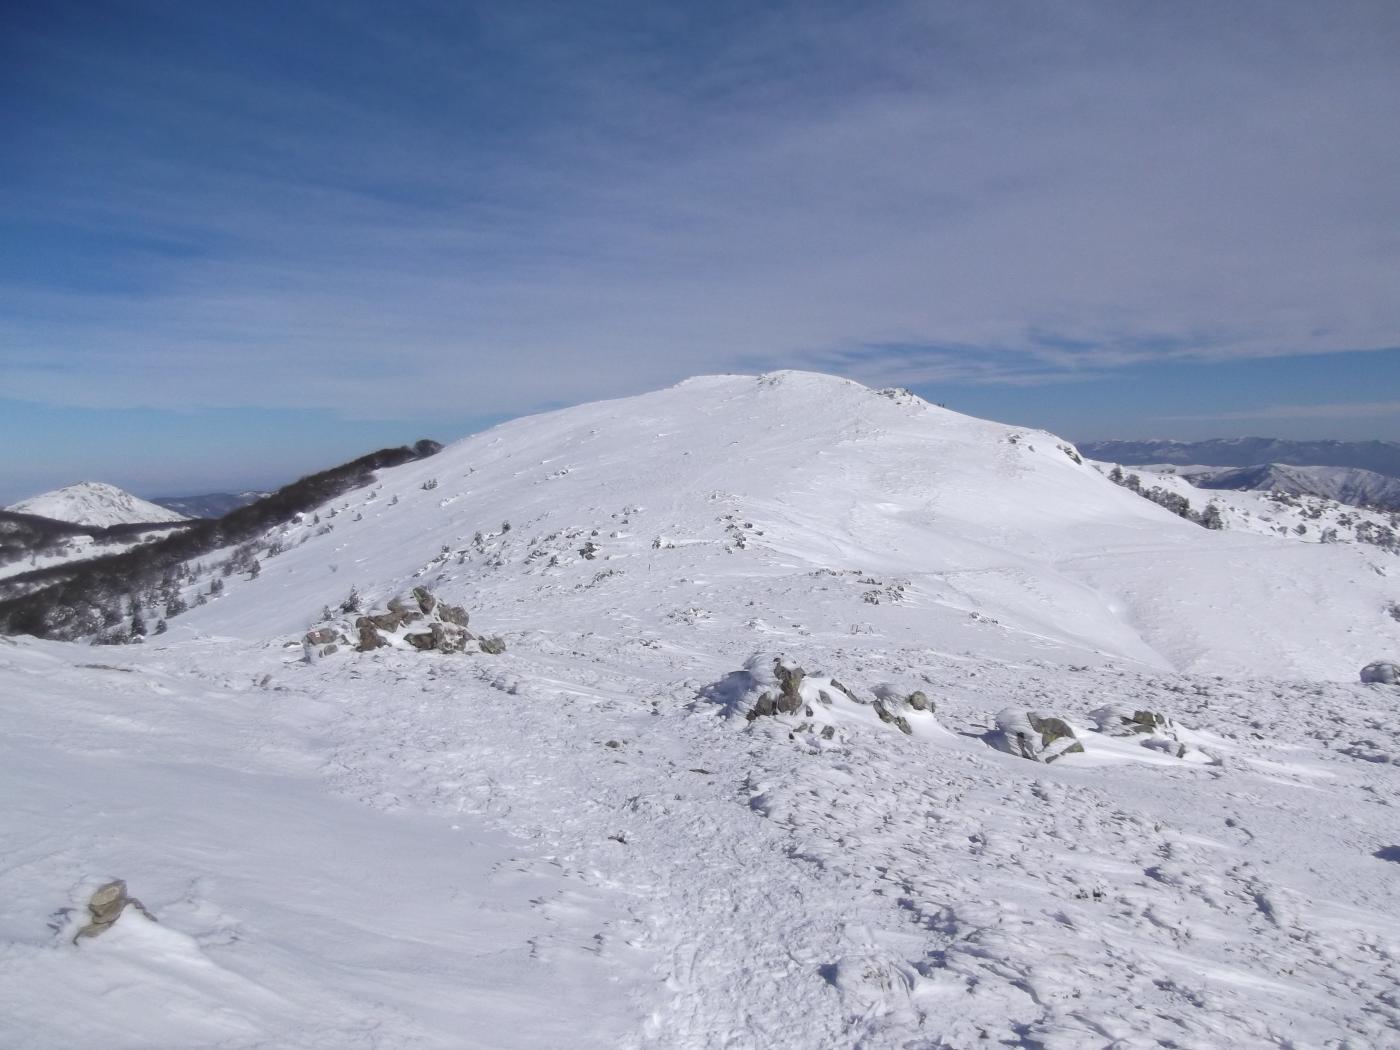 Reixa (Monte) Alta via dal Monte Beigua al Monte Reixa 2015-02-08